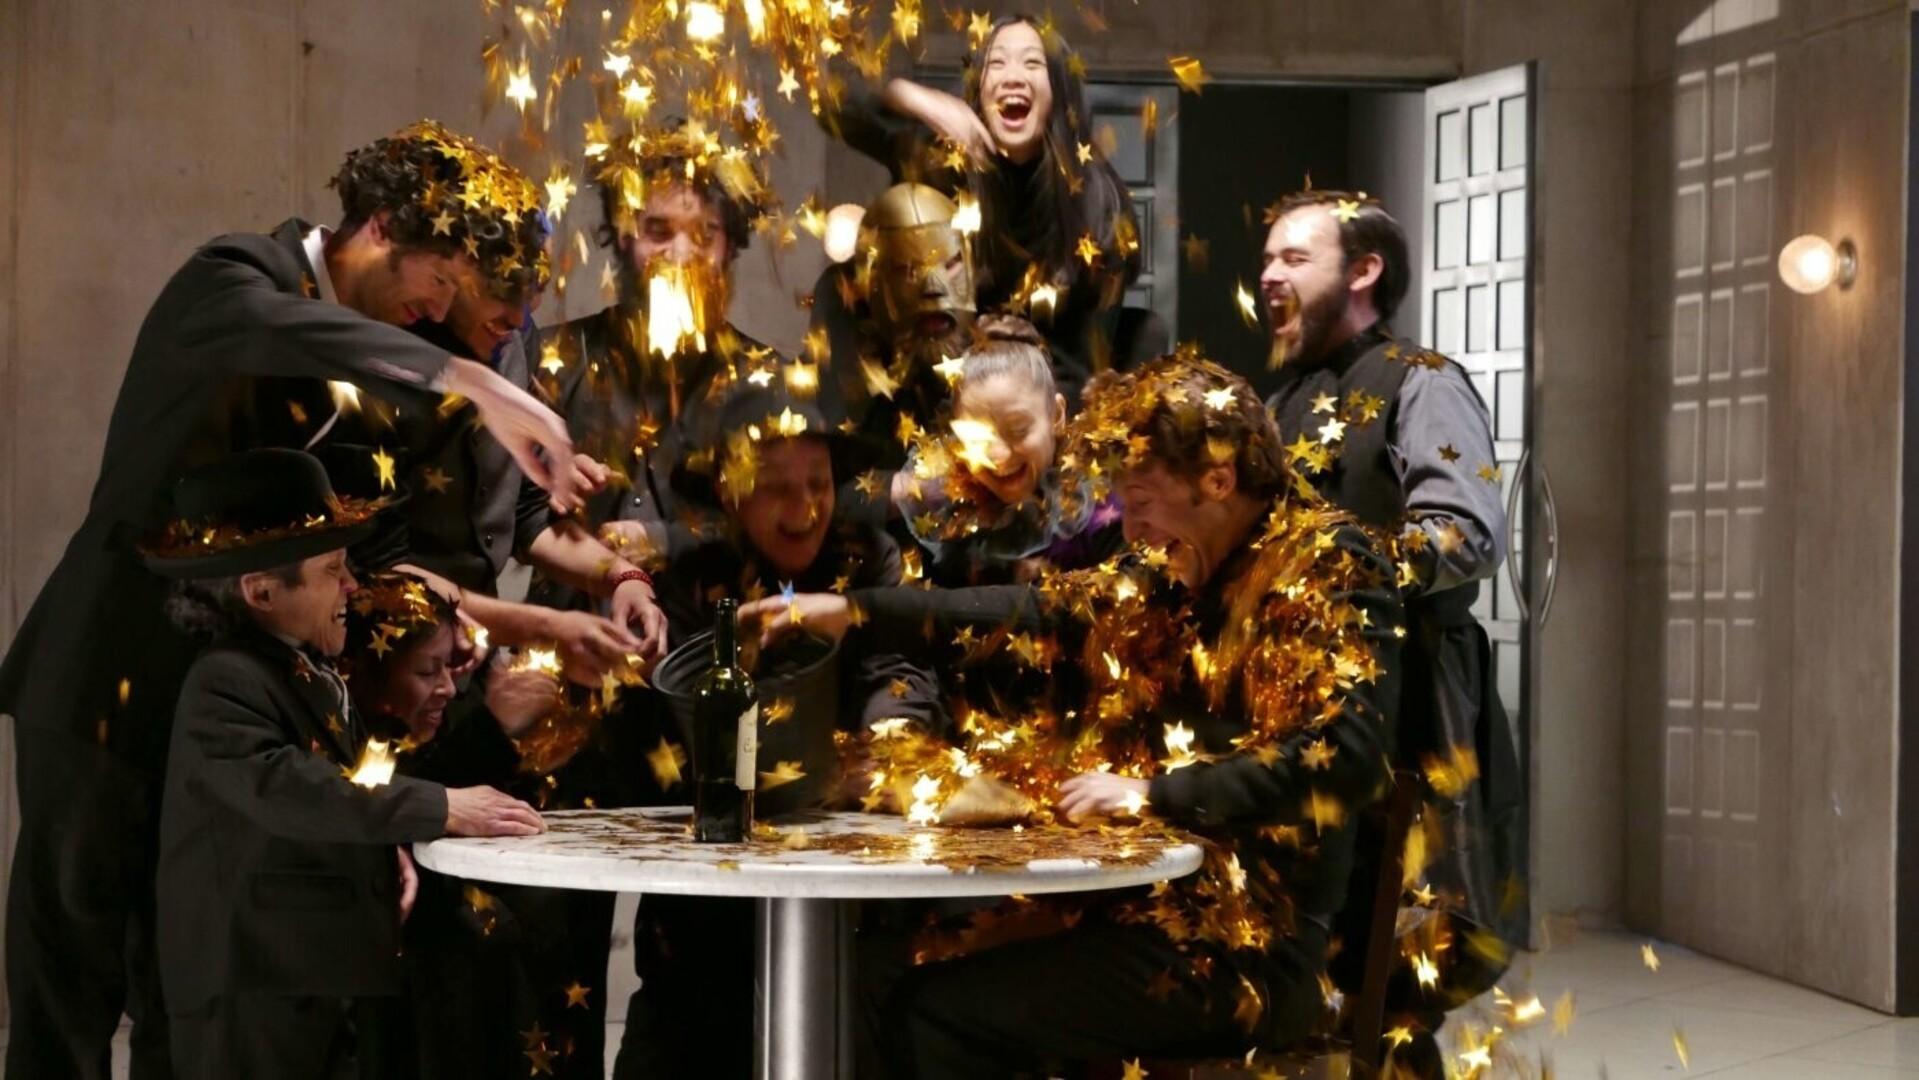 dc4da110dc4 Kinodesse jõuab Alejandro Jodorowsky autobiograafiline hullus